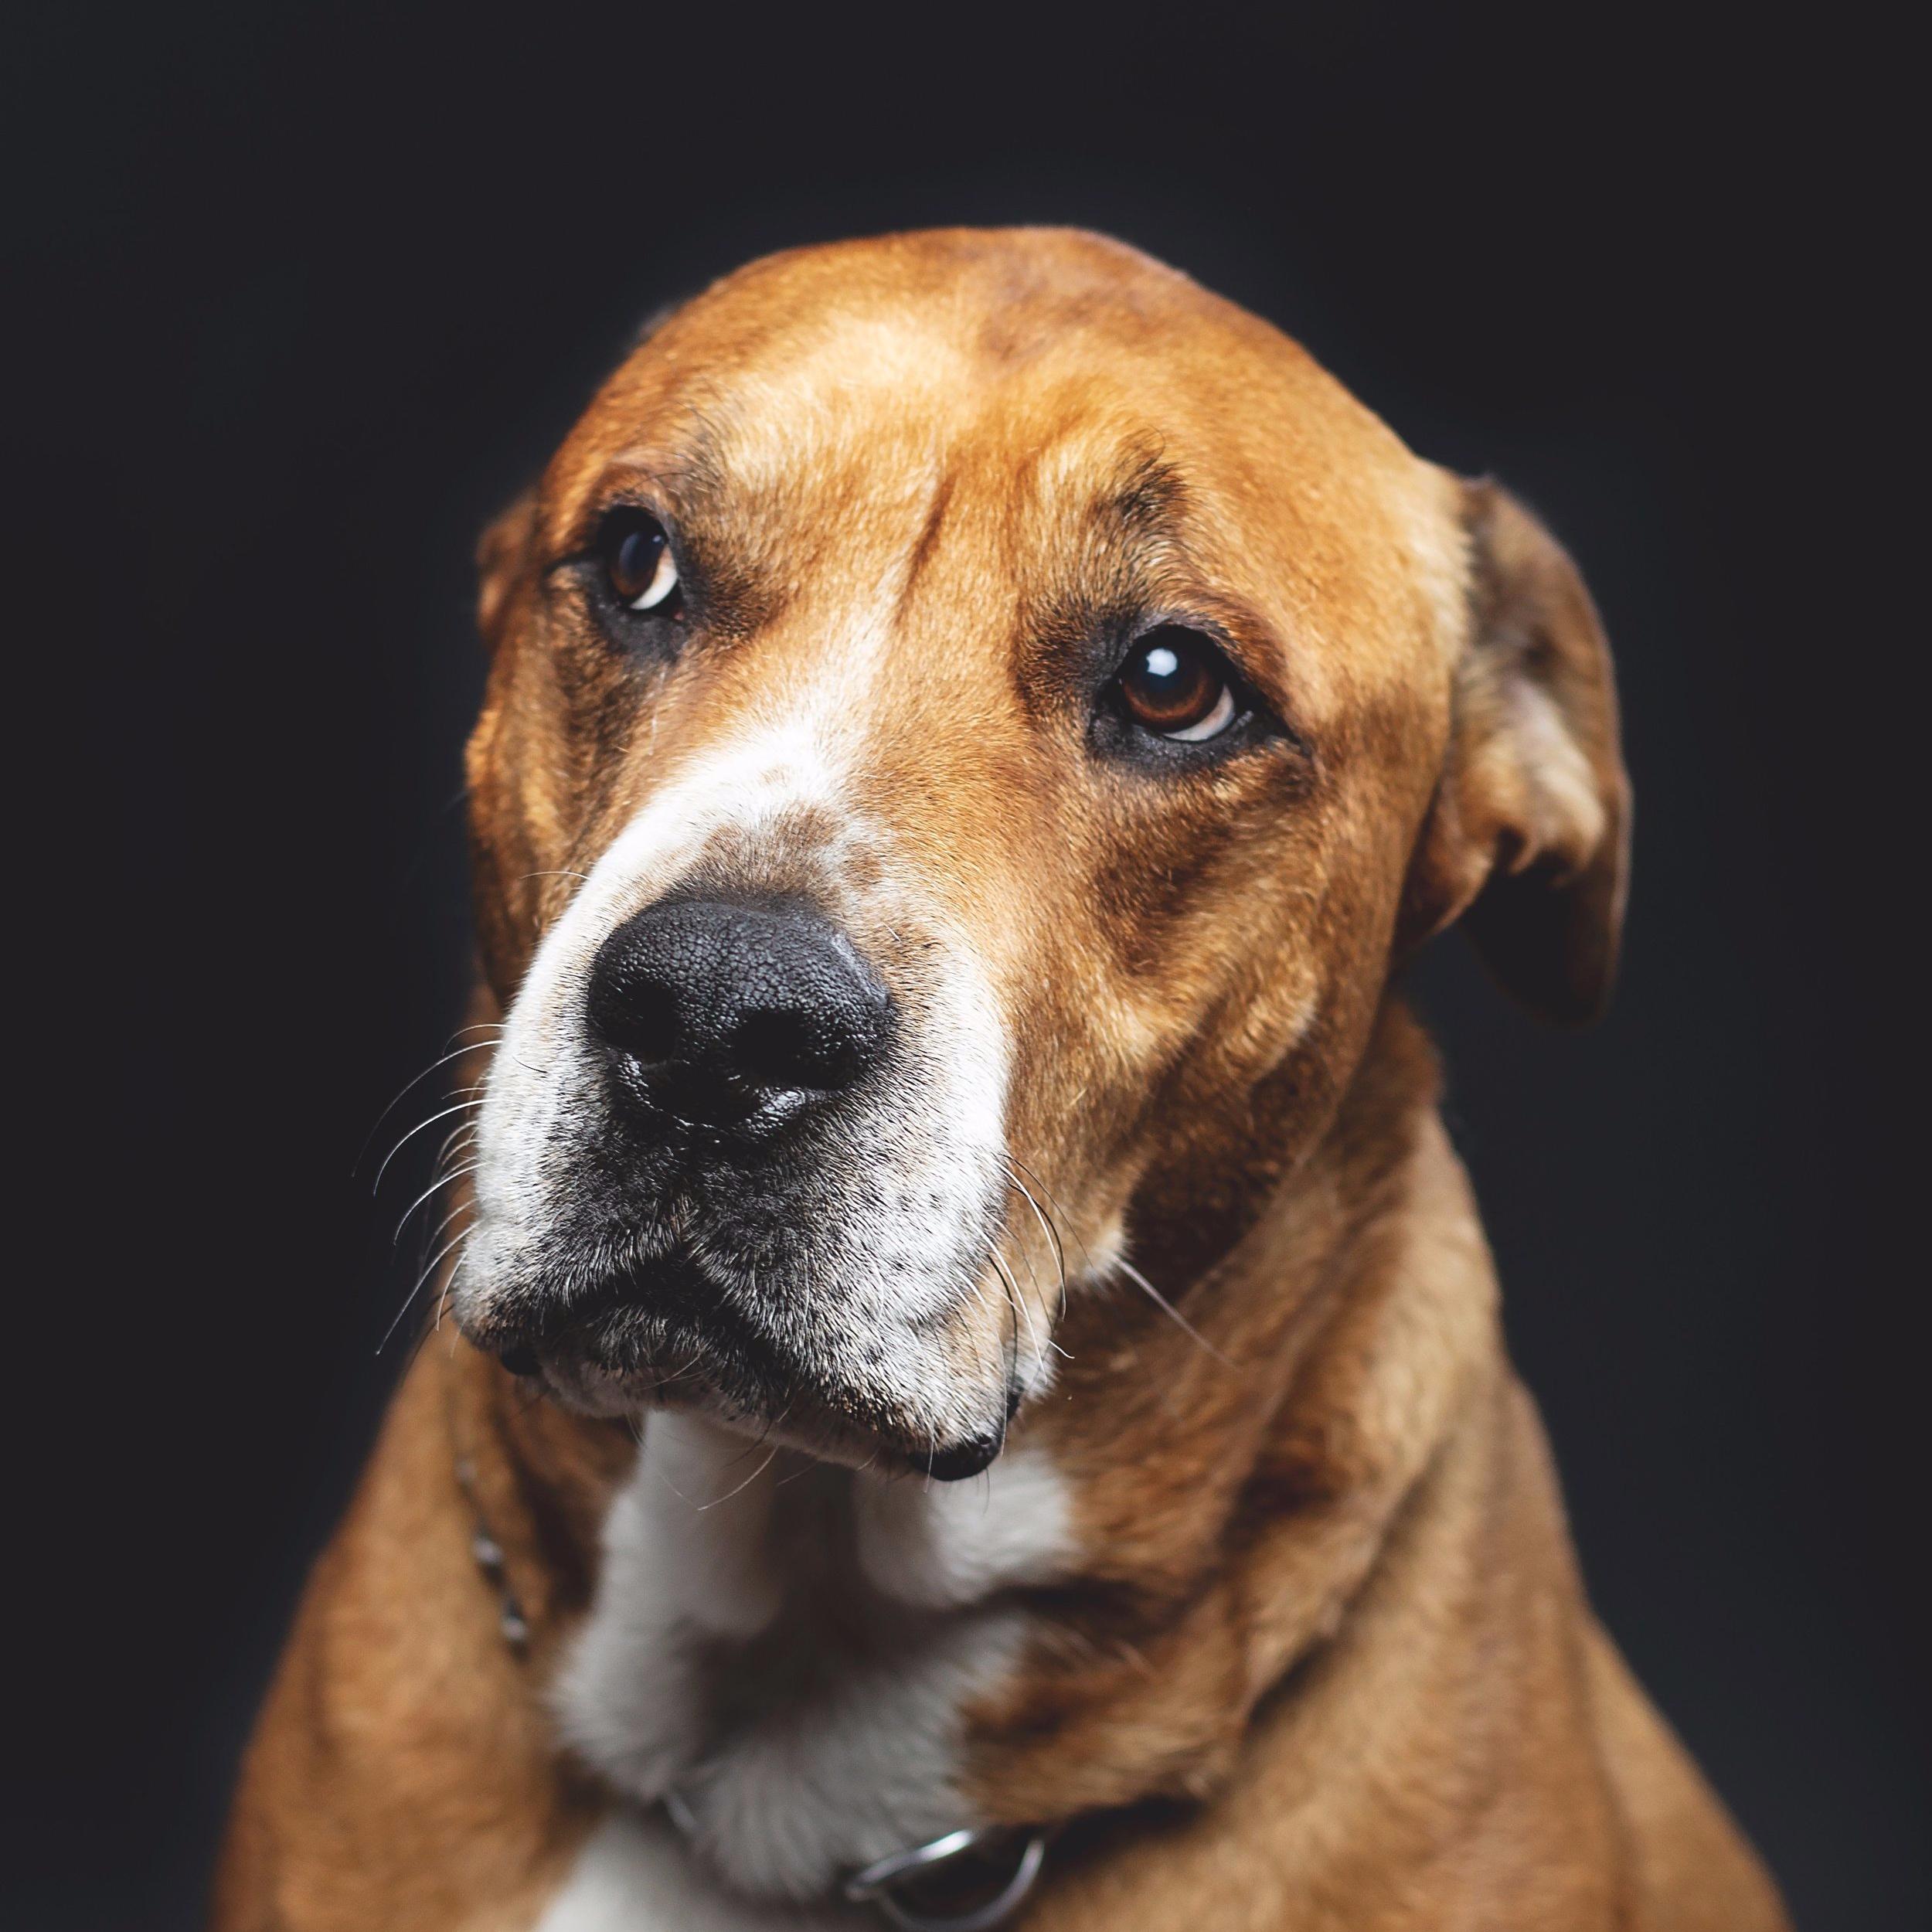 Homeward Bound Animal Care LLC  New Hampshire  Calming Signals Turid Rugaas  Communicate with your dog  Dog behavior  Dog Body language